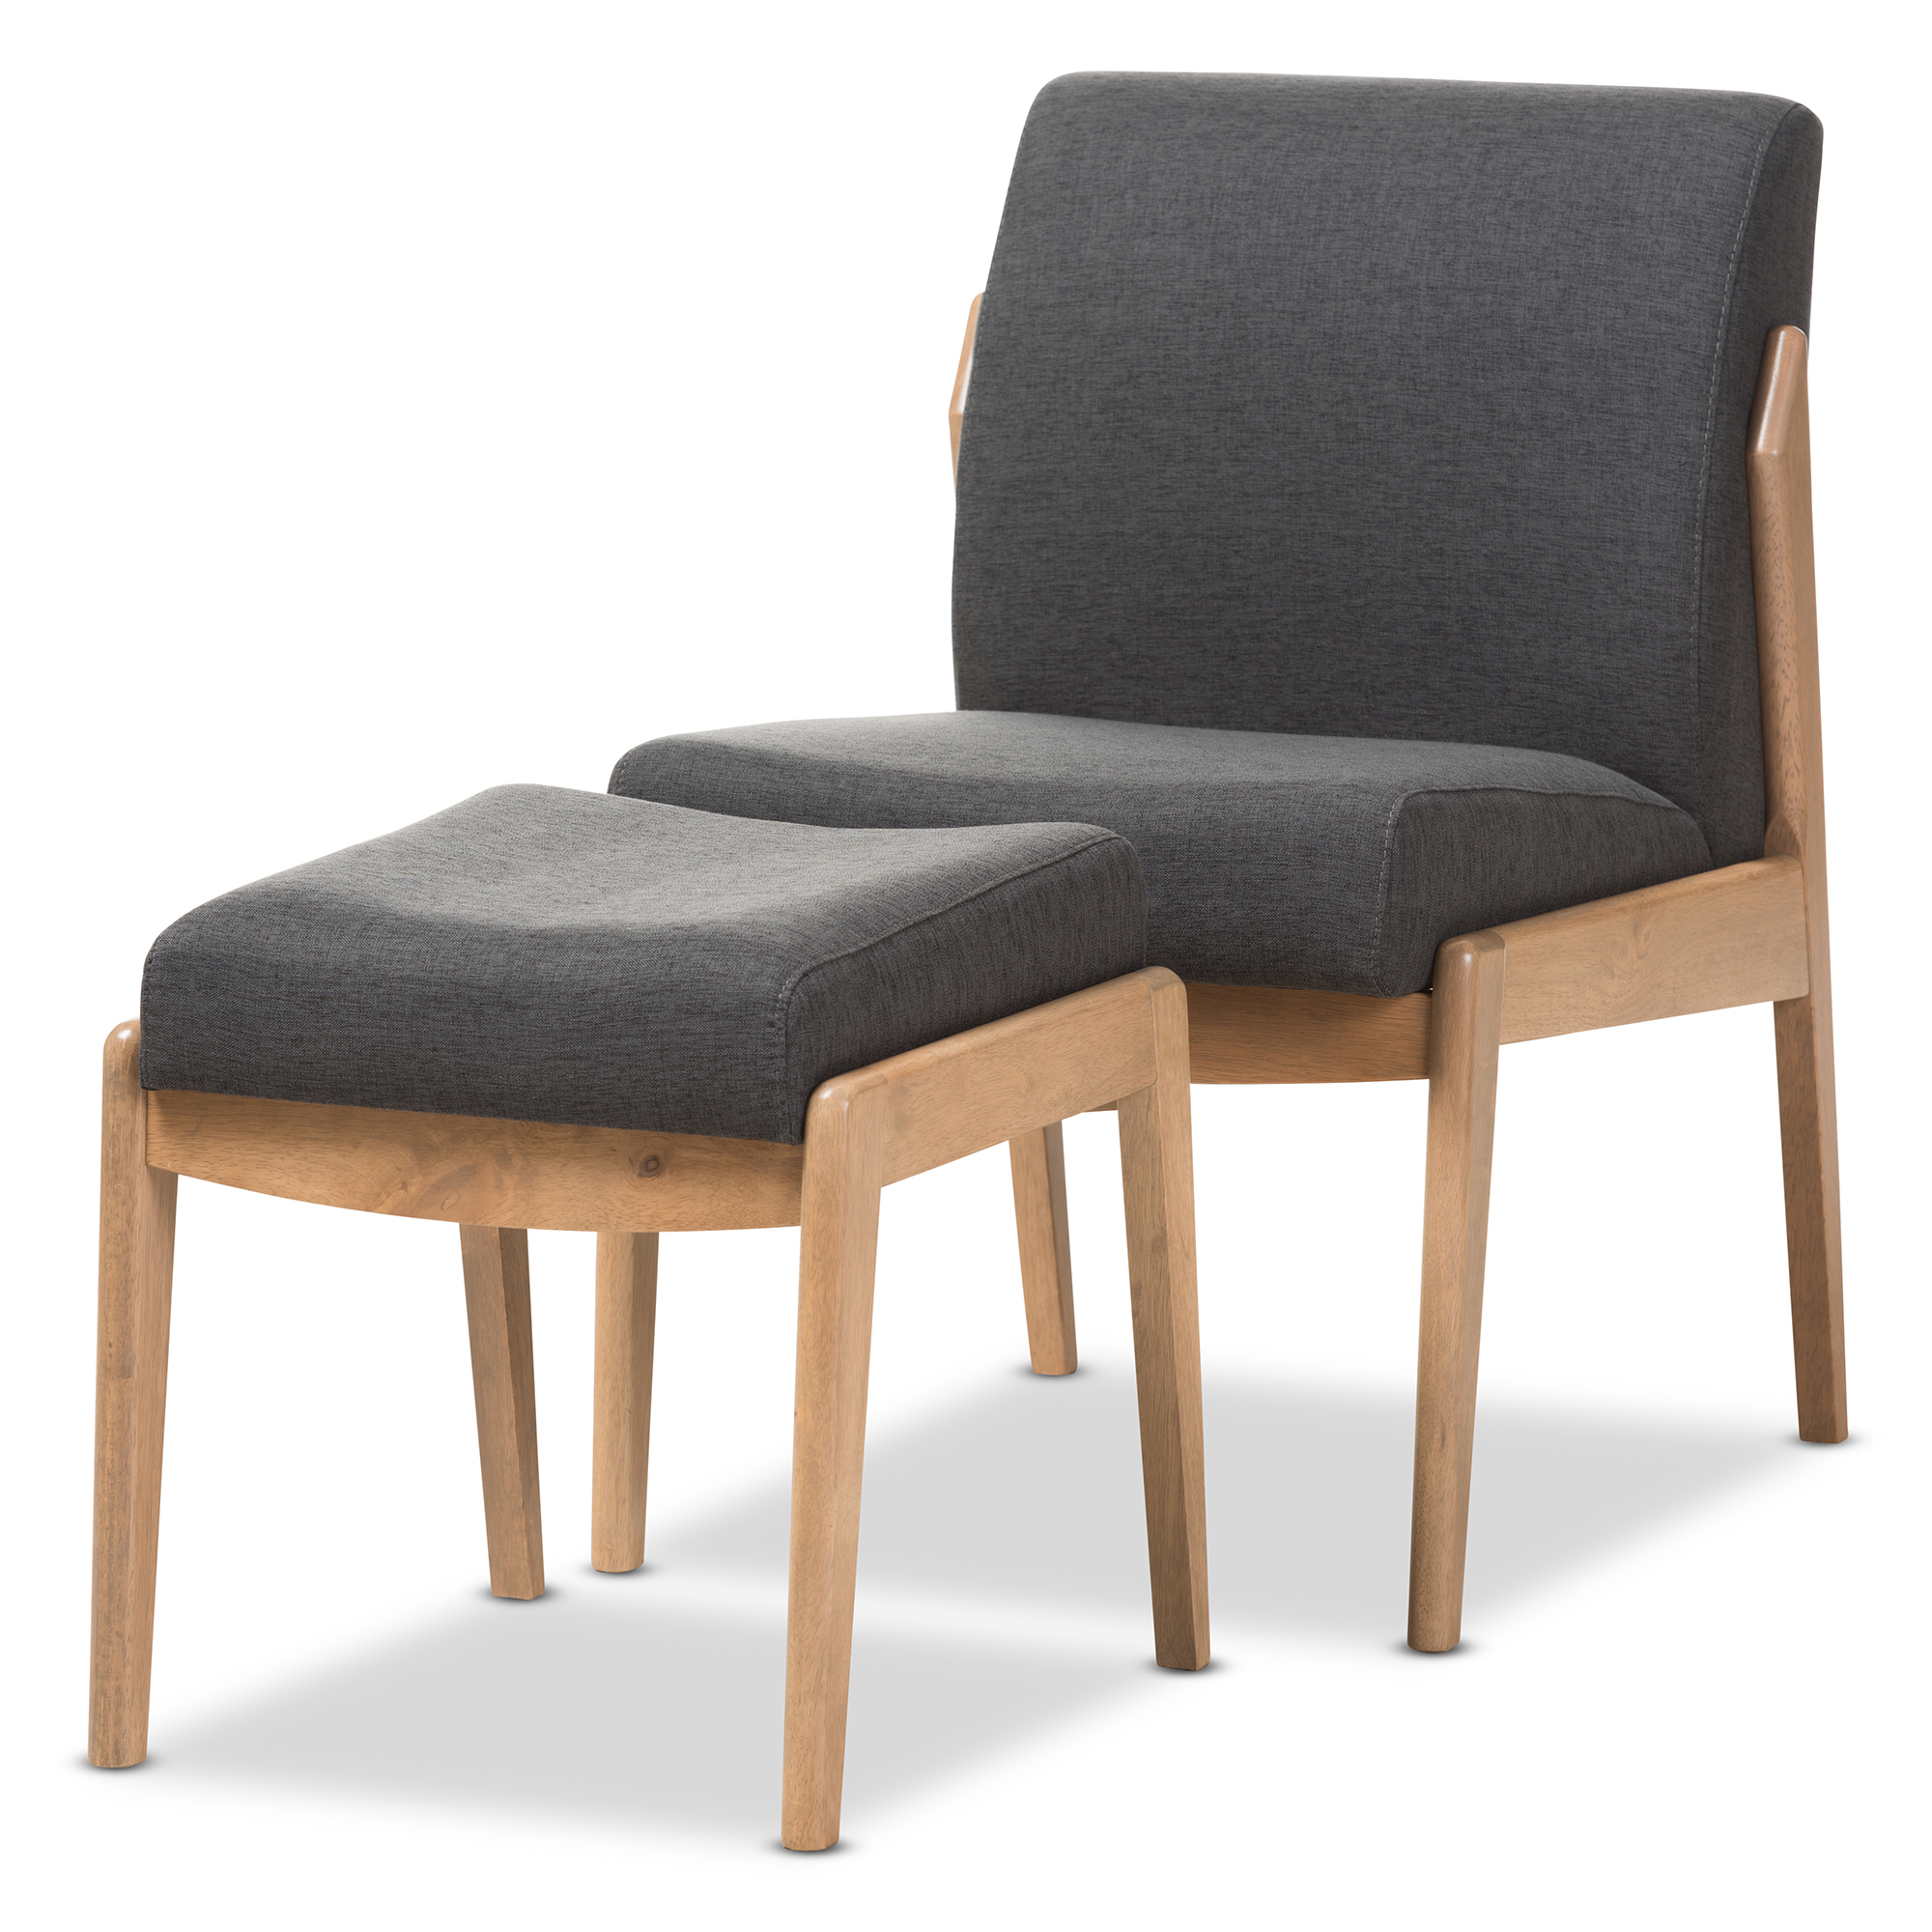 baxton studio wera midcentury retro modern dark grey fabric slipper lounge chair and ottoman